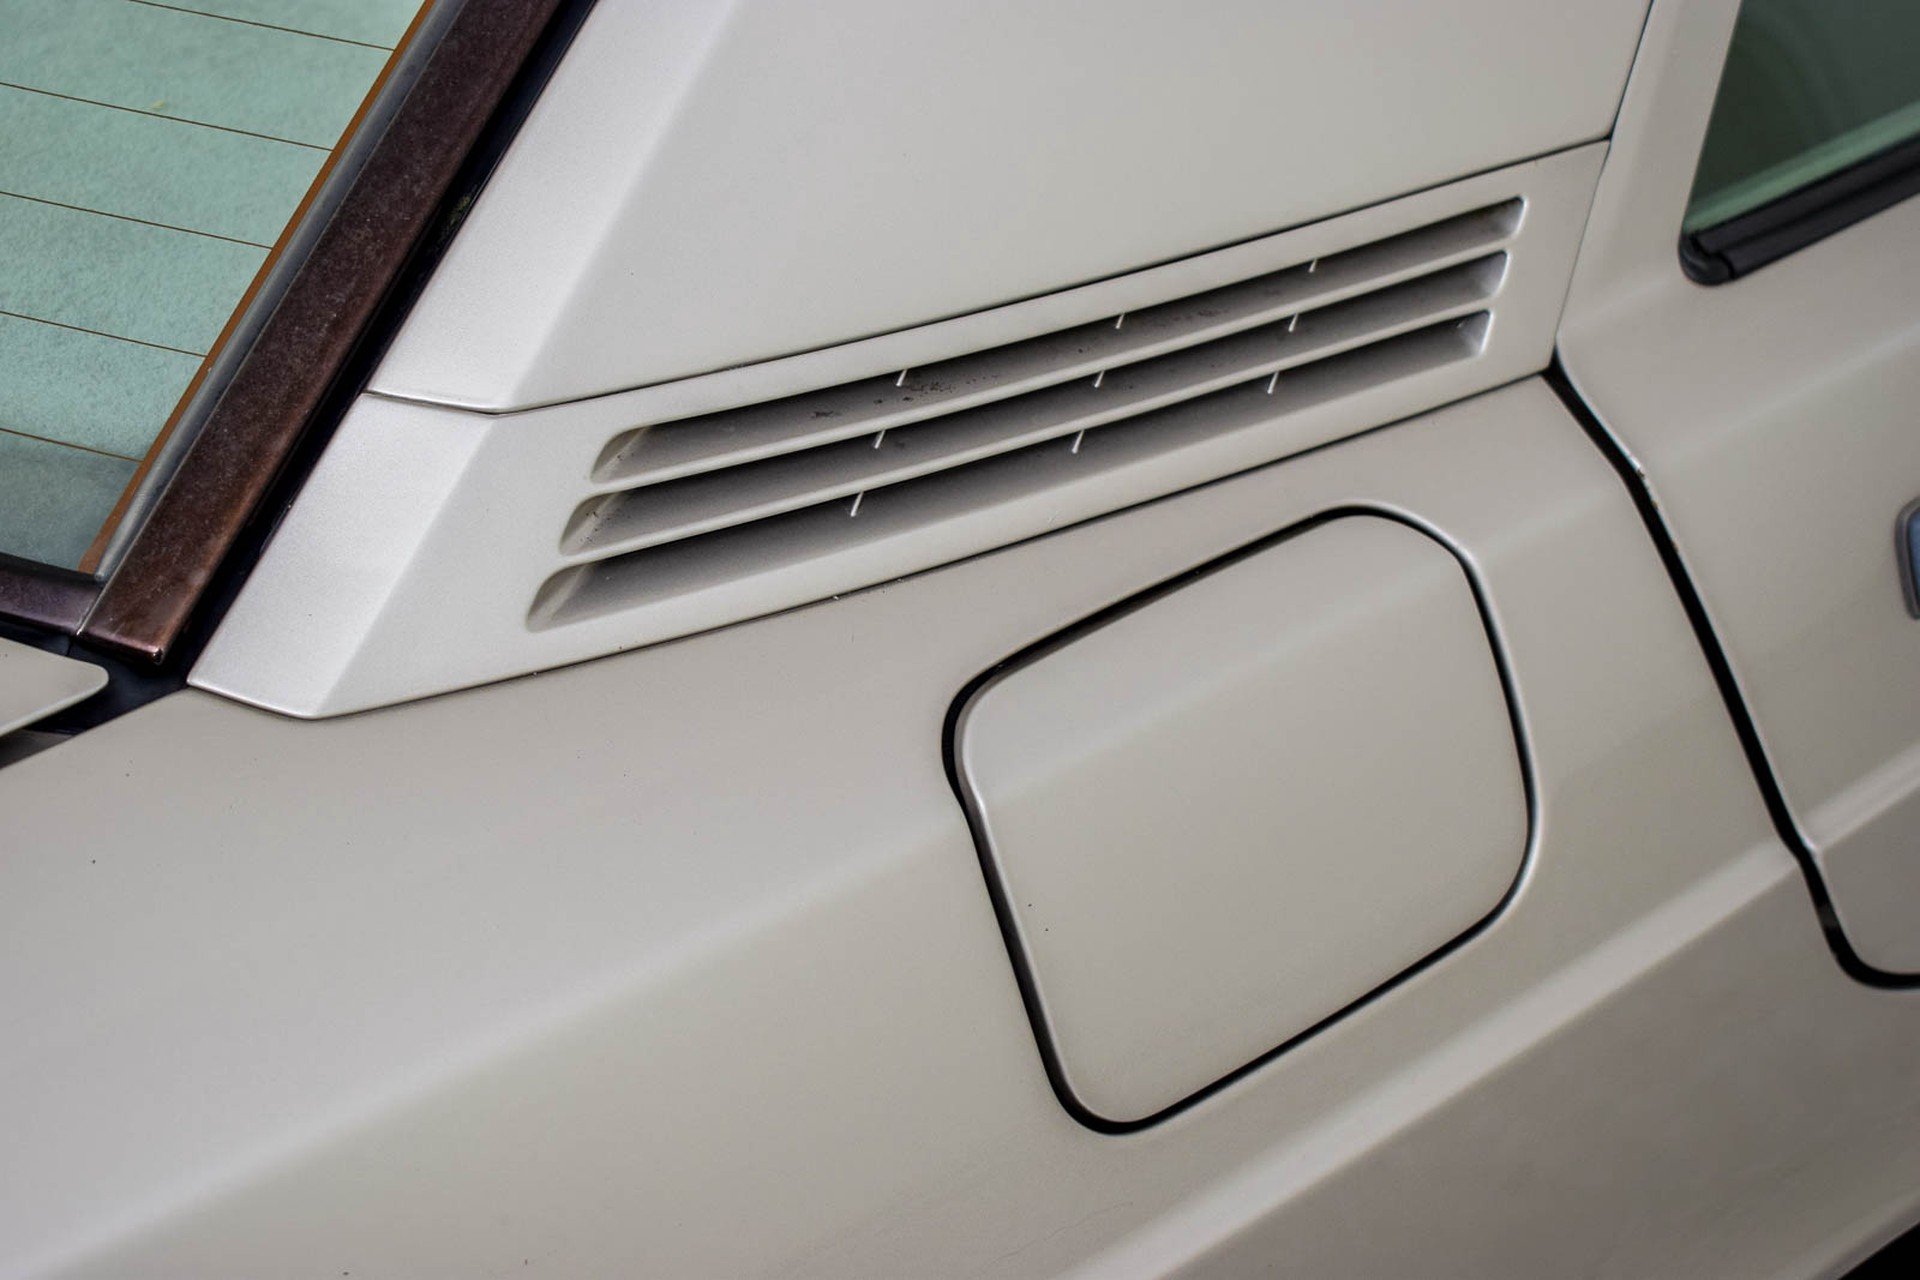 Mercedes-Benz 190 2.5 D Turbo Diesel Foto 39